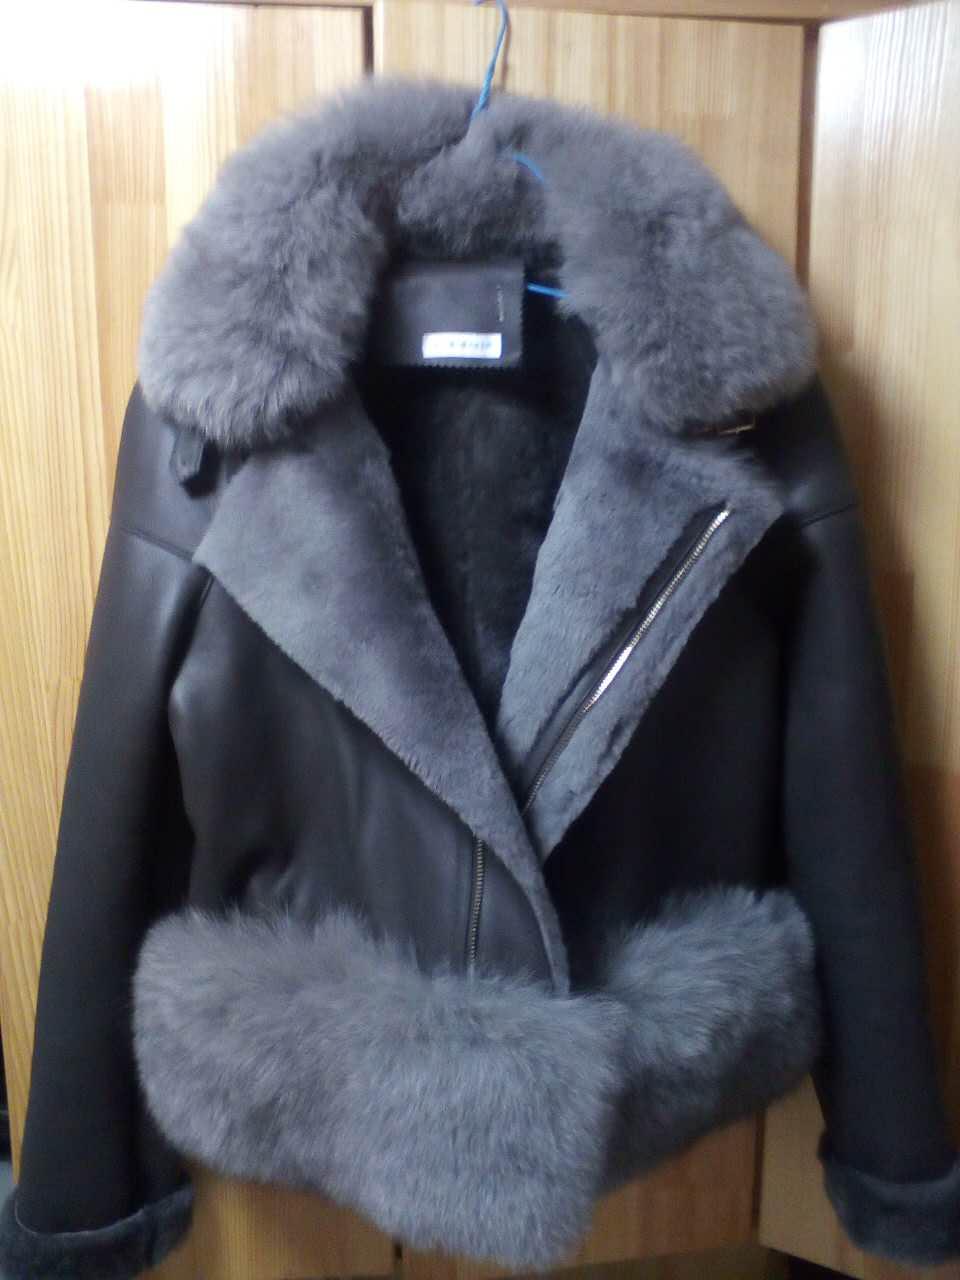 2018 New genuine natural real whole skin rabbit fur coat women long fashion jacket winter outwear overcoat free shipping JN431